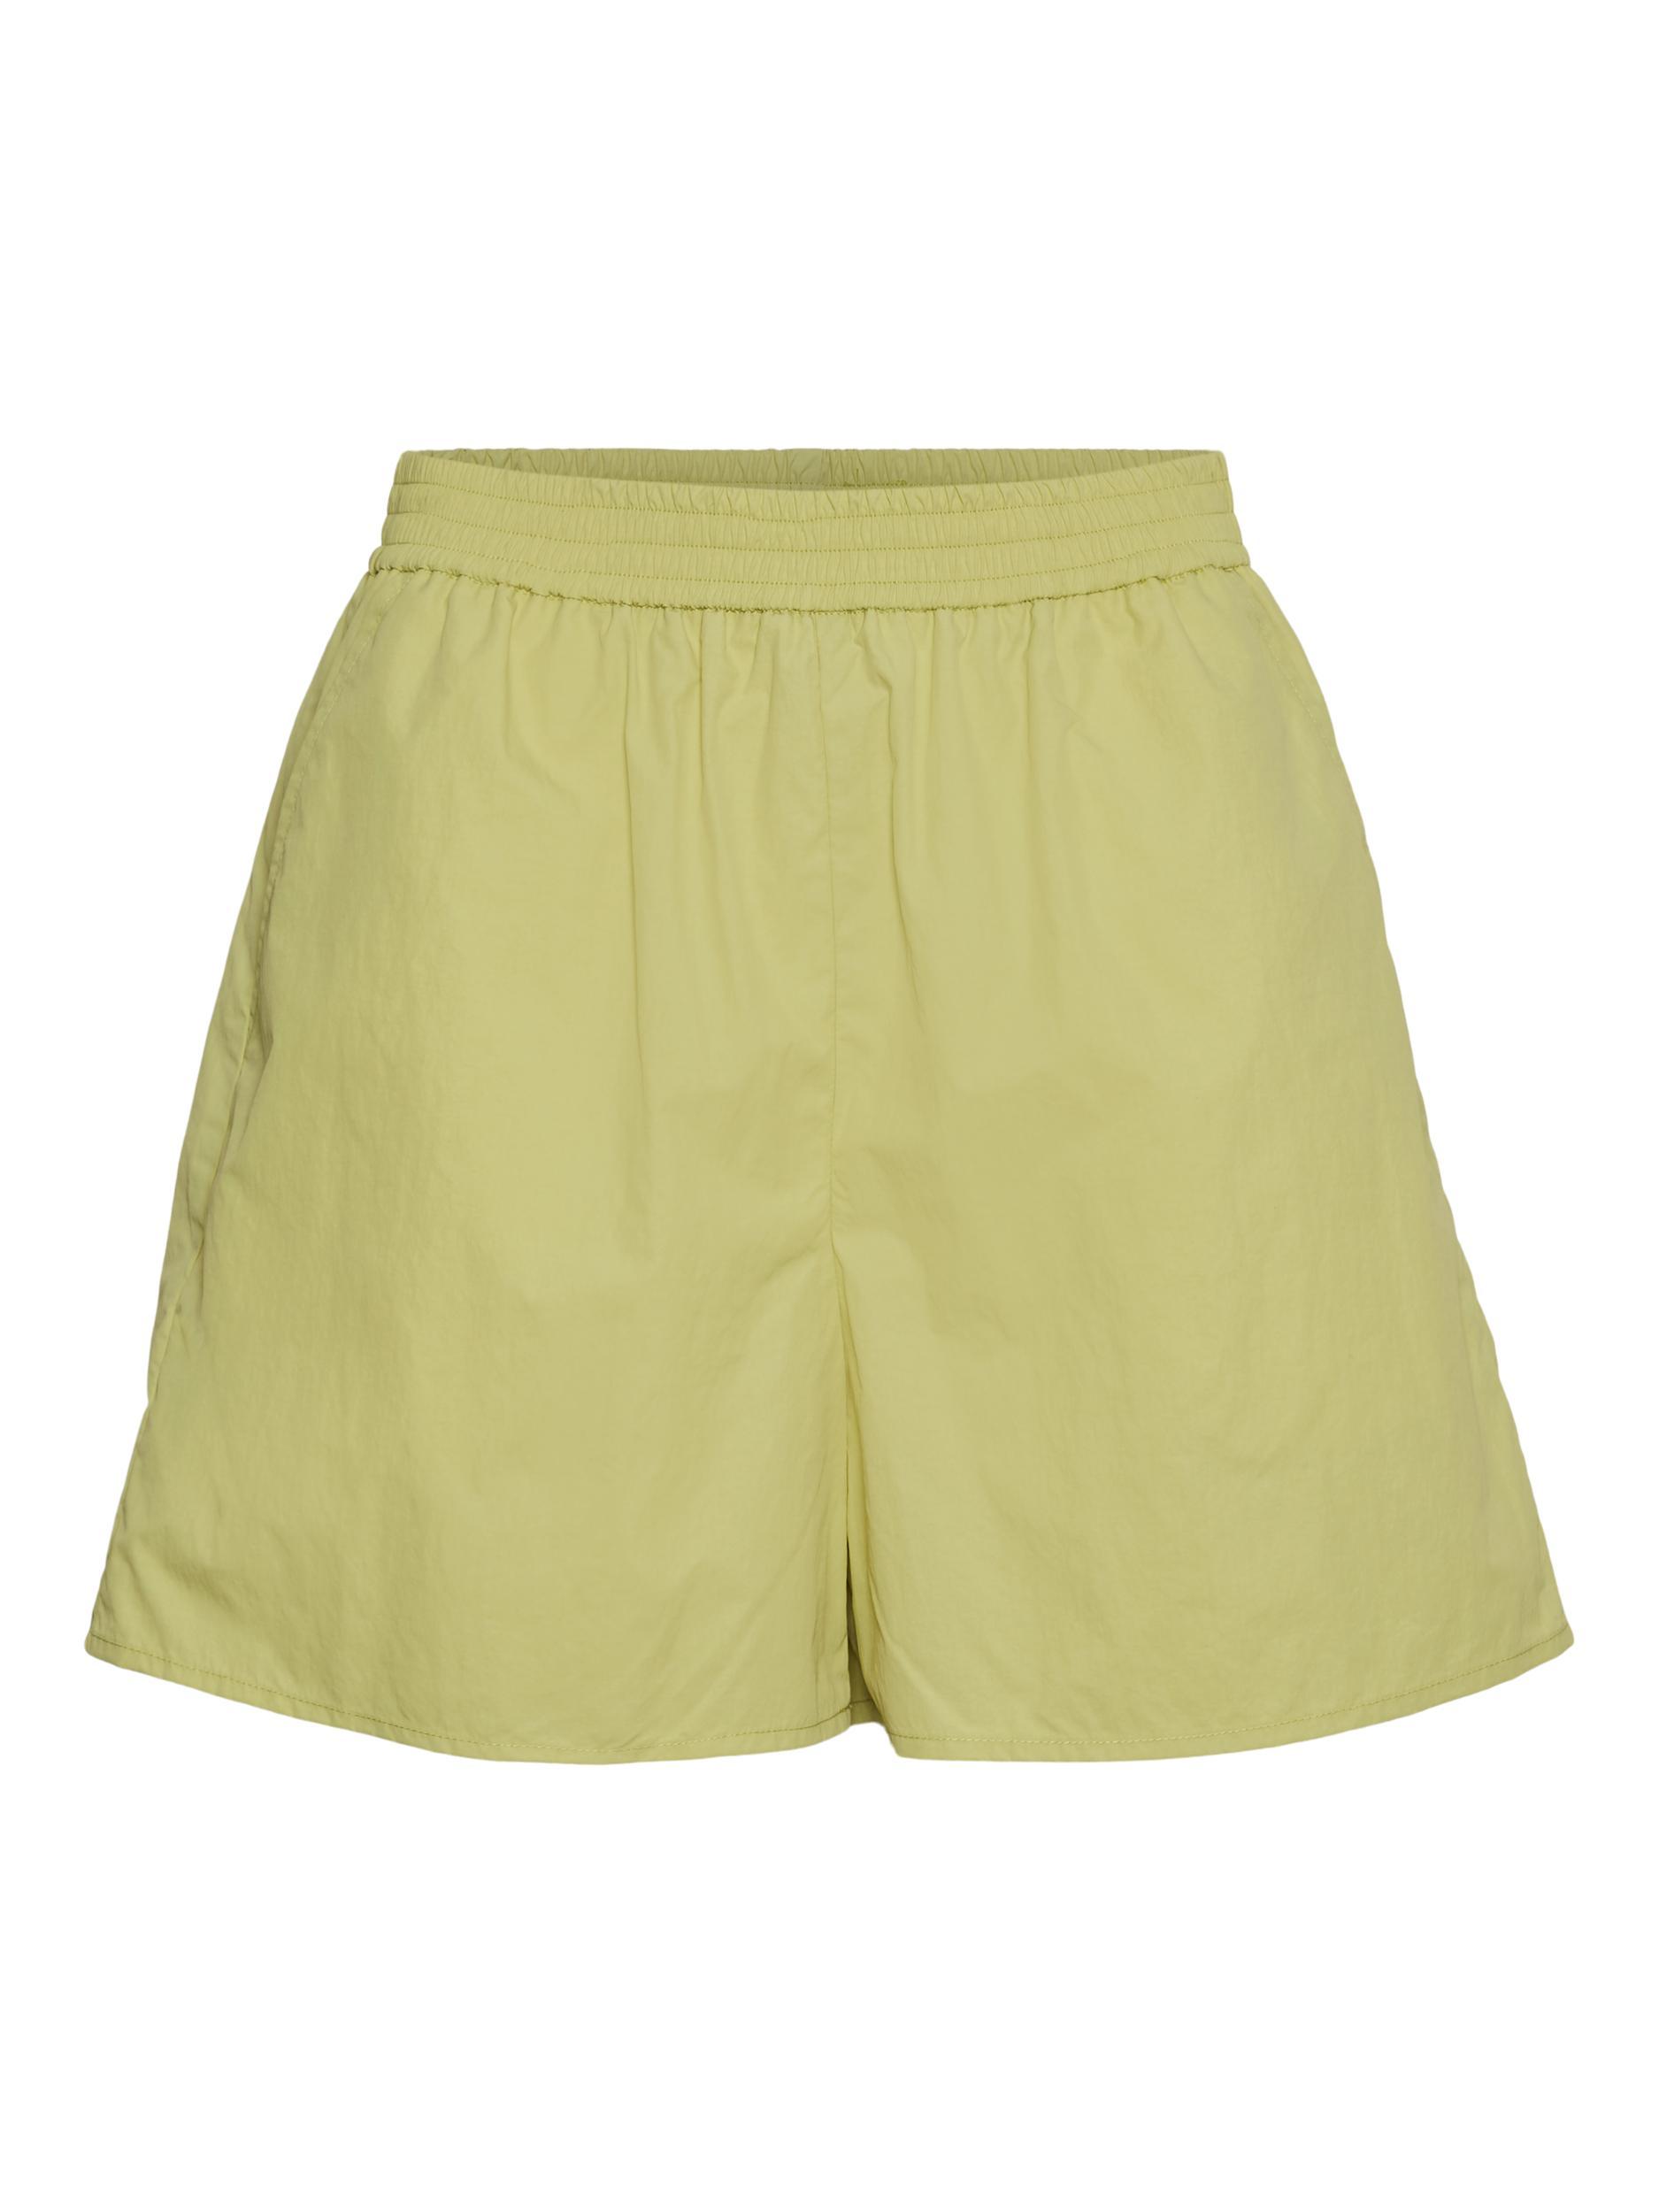 Vero Moda Oislay shorts, pale green, x-large